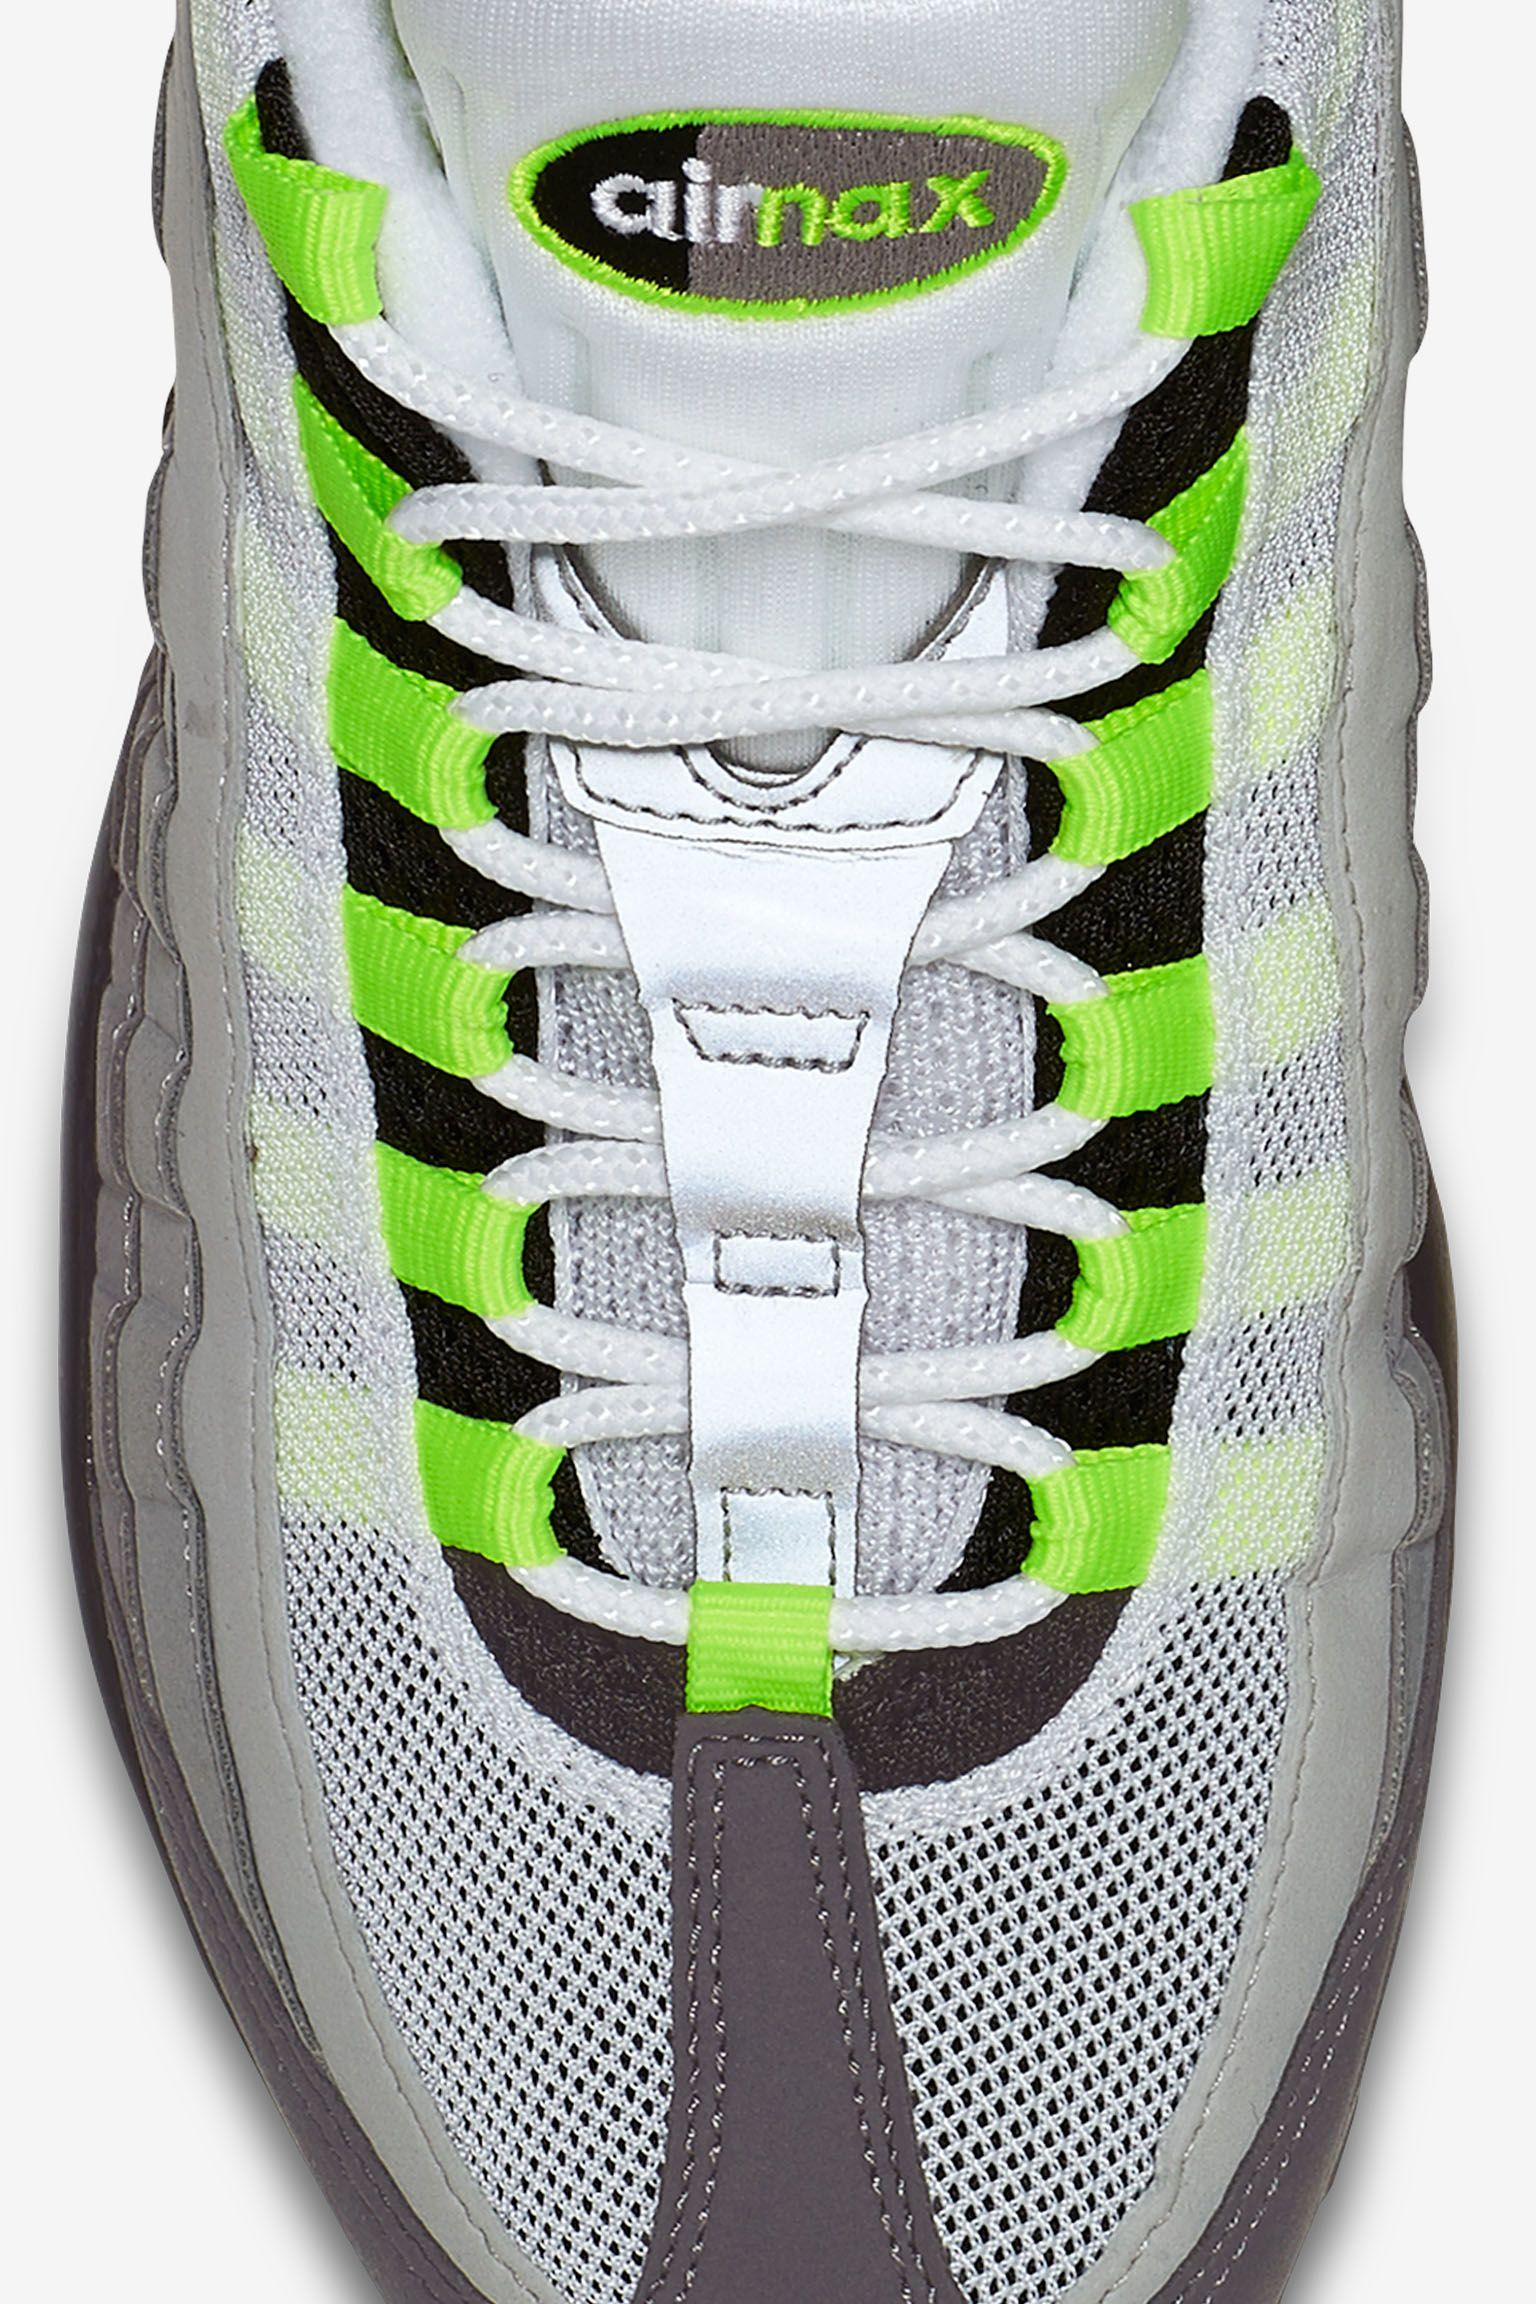 25f2db6450d7 50% off nike air max 95 neon yellow cool grey anatomy edafc 58551